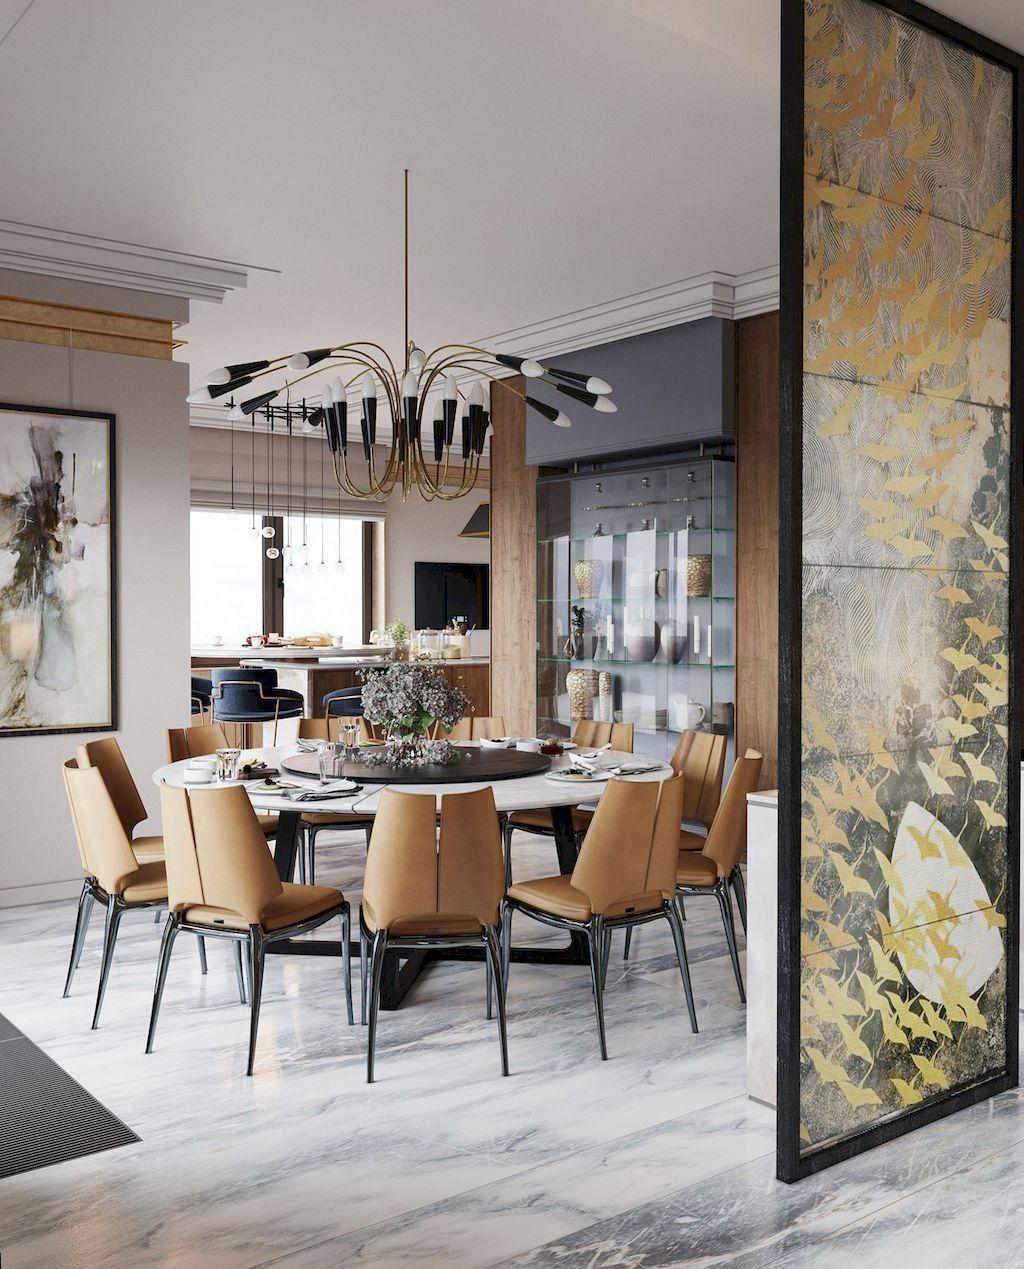 Luxury Dining Room Decoration Ideas images